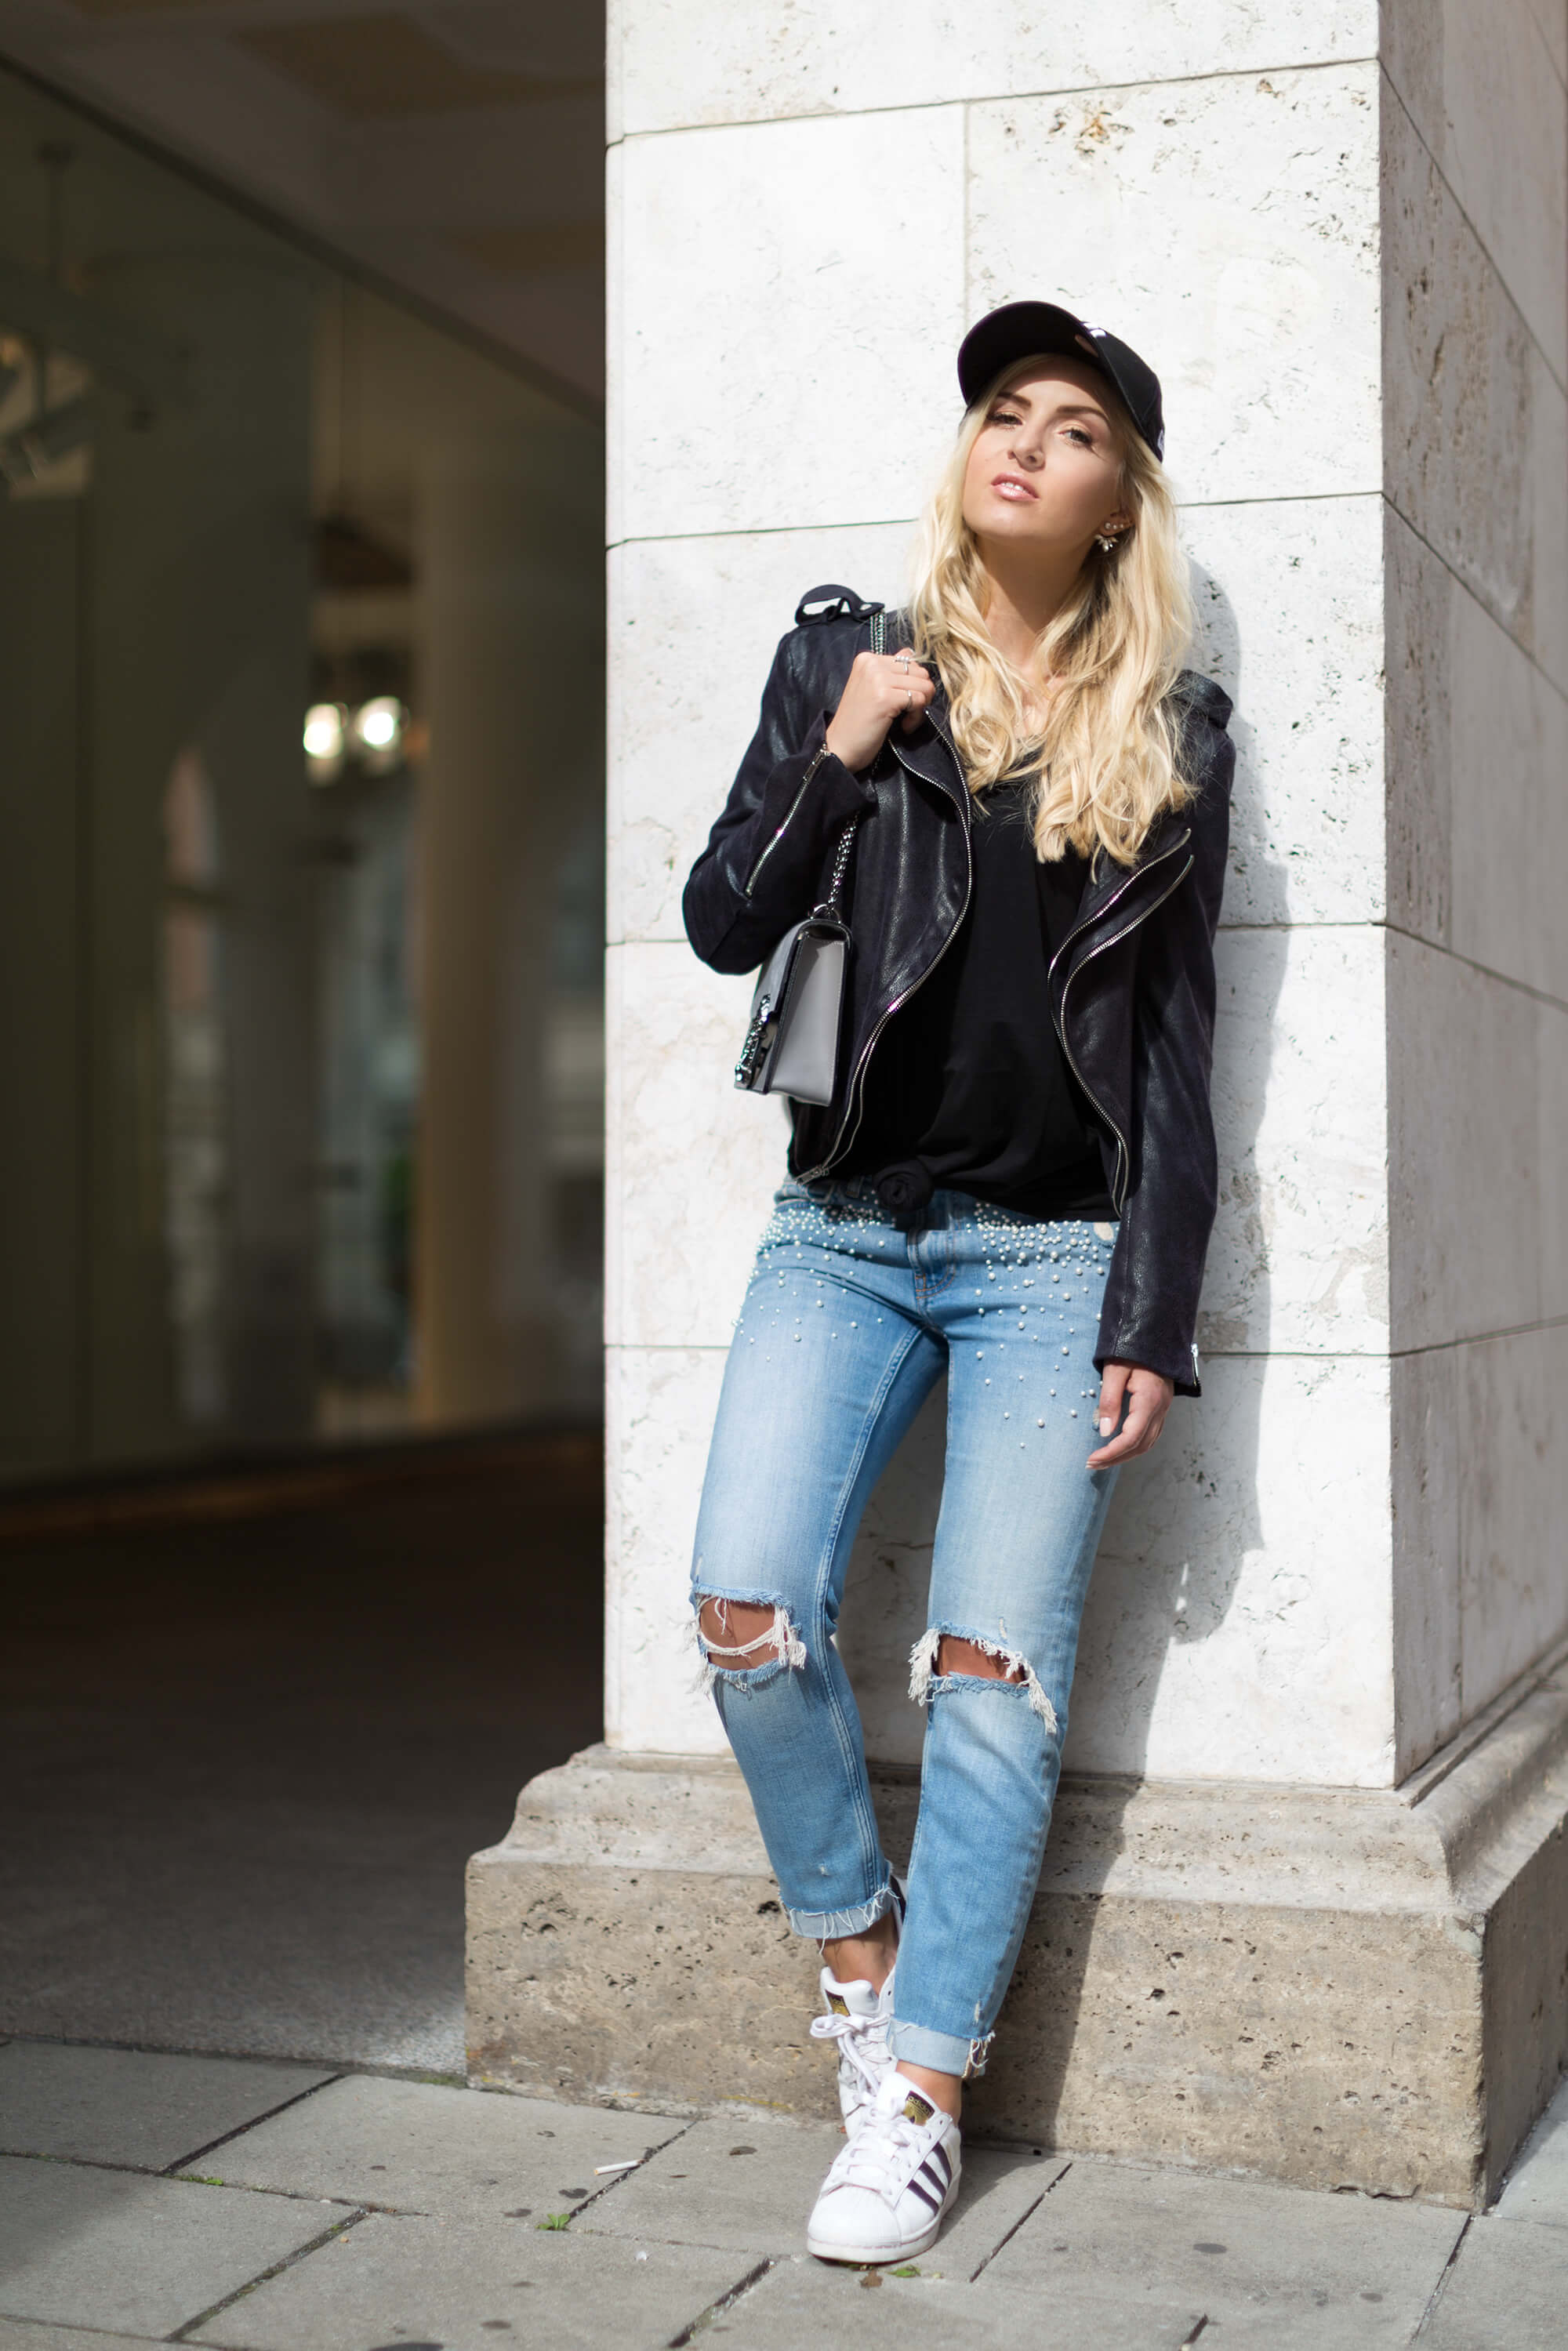 Fashionblog Katefully München Munich Street Style Outfit Cap Lederjacke Perlen Jeans lässig